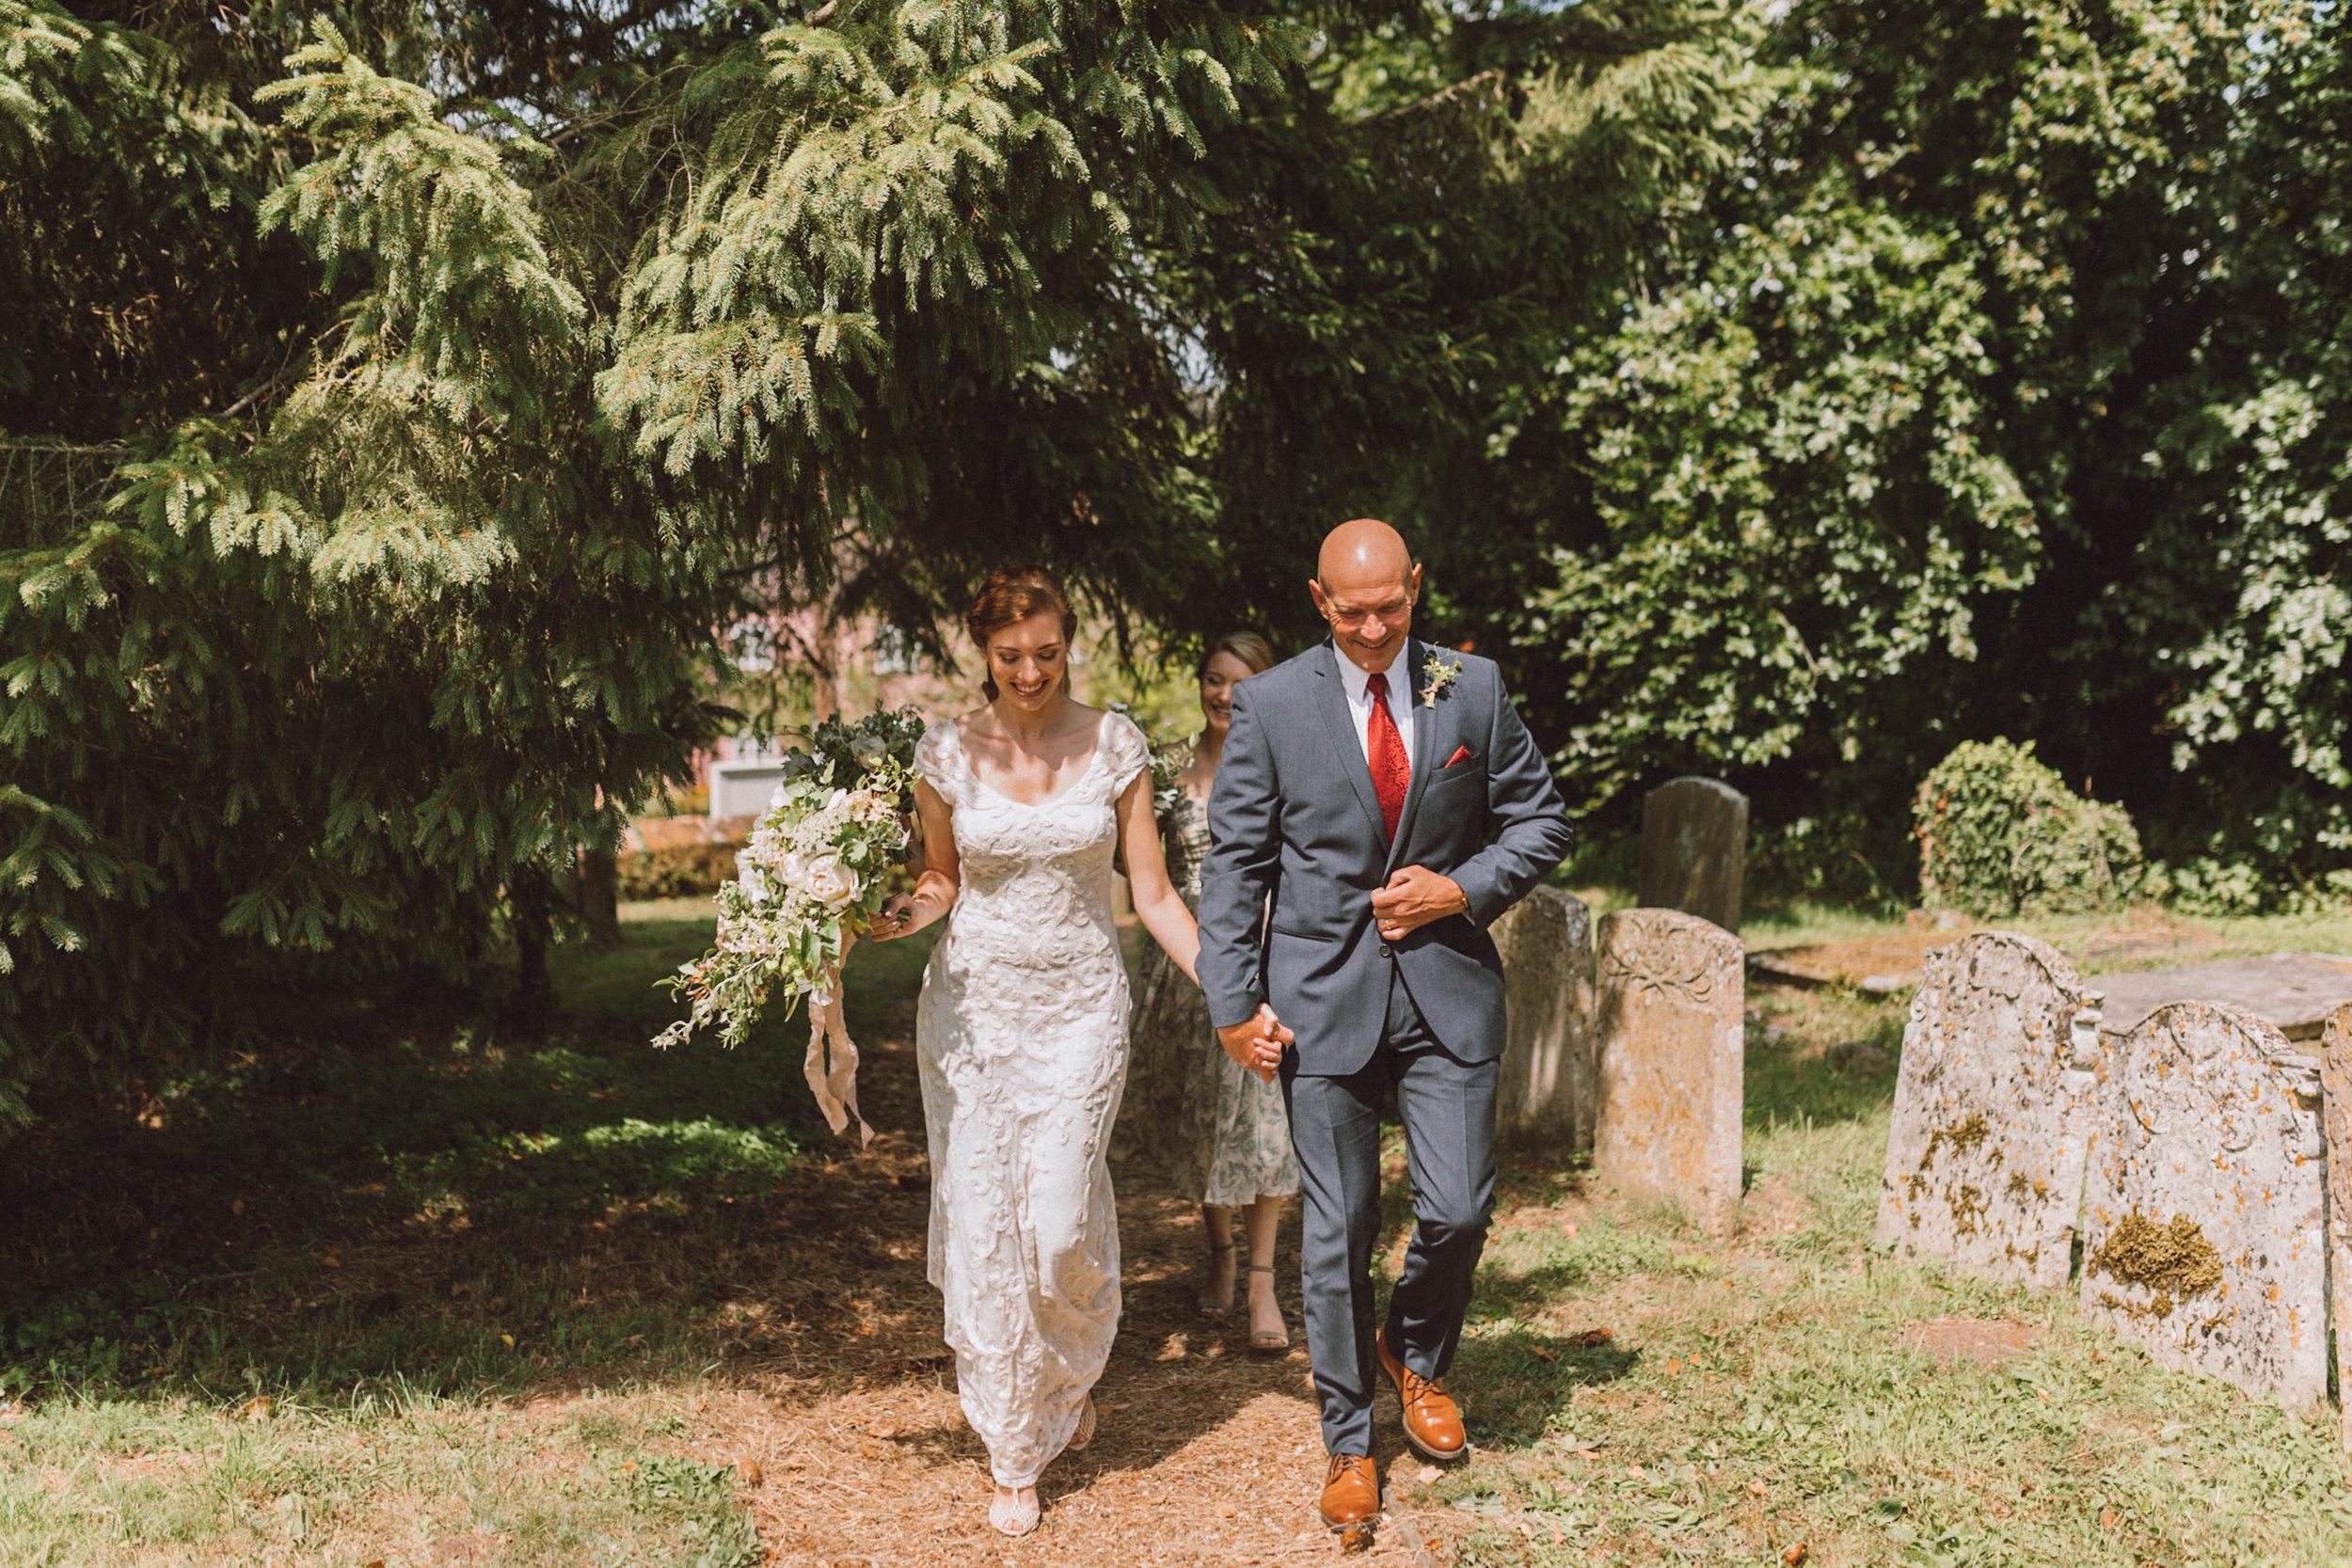 Emily & Steve Photography Summer-Garden-Wedding-72.jpg